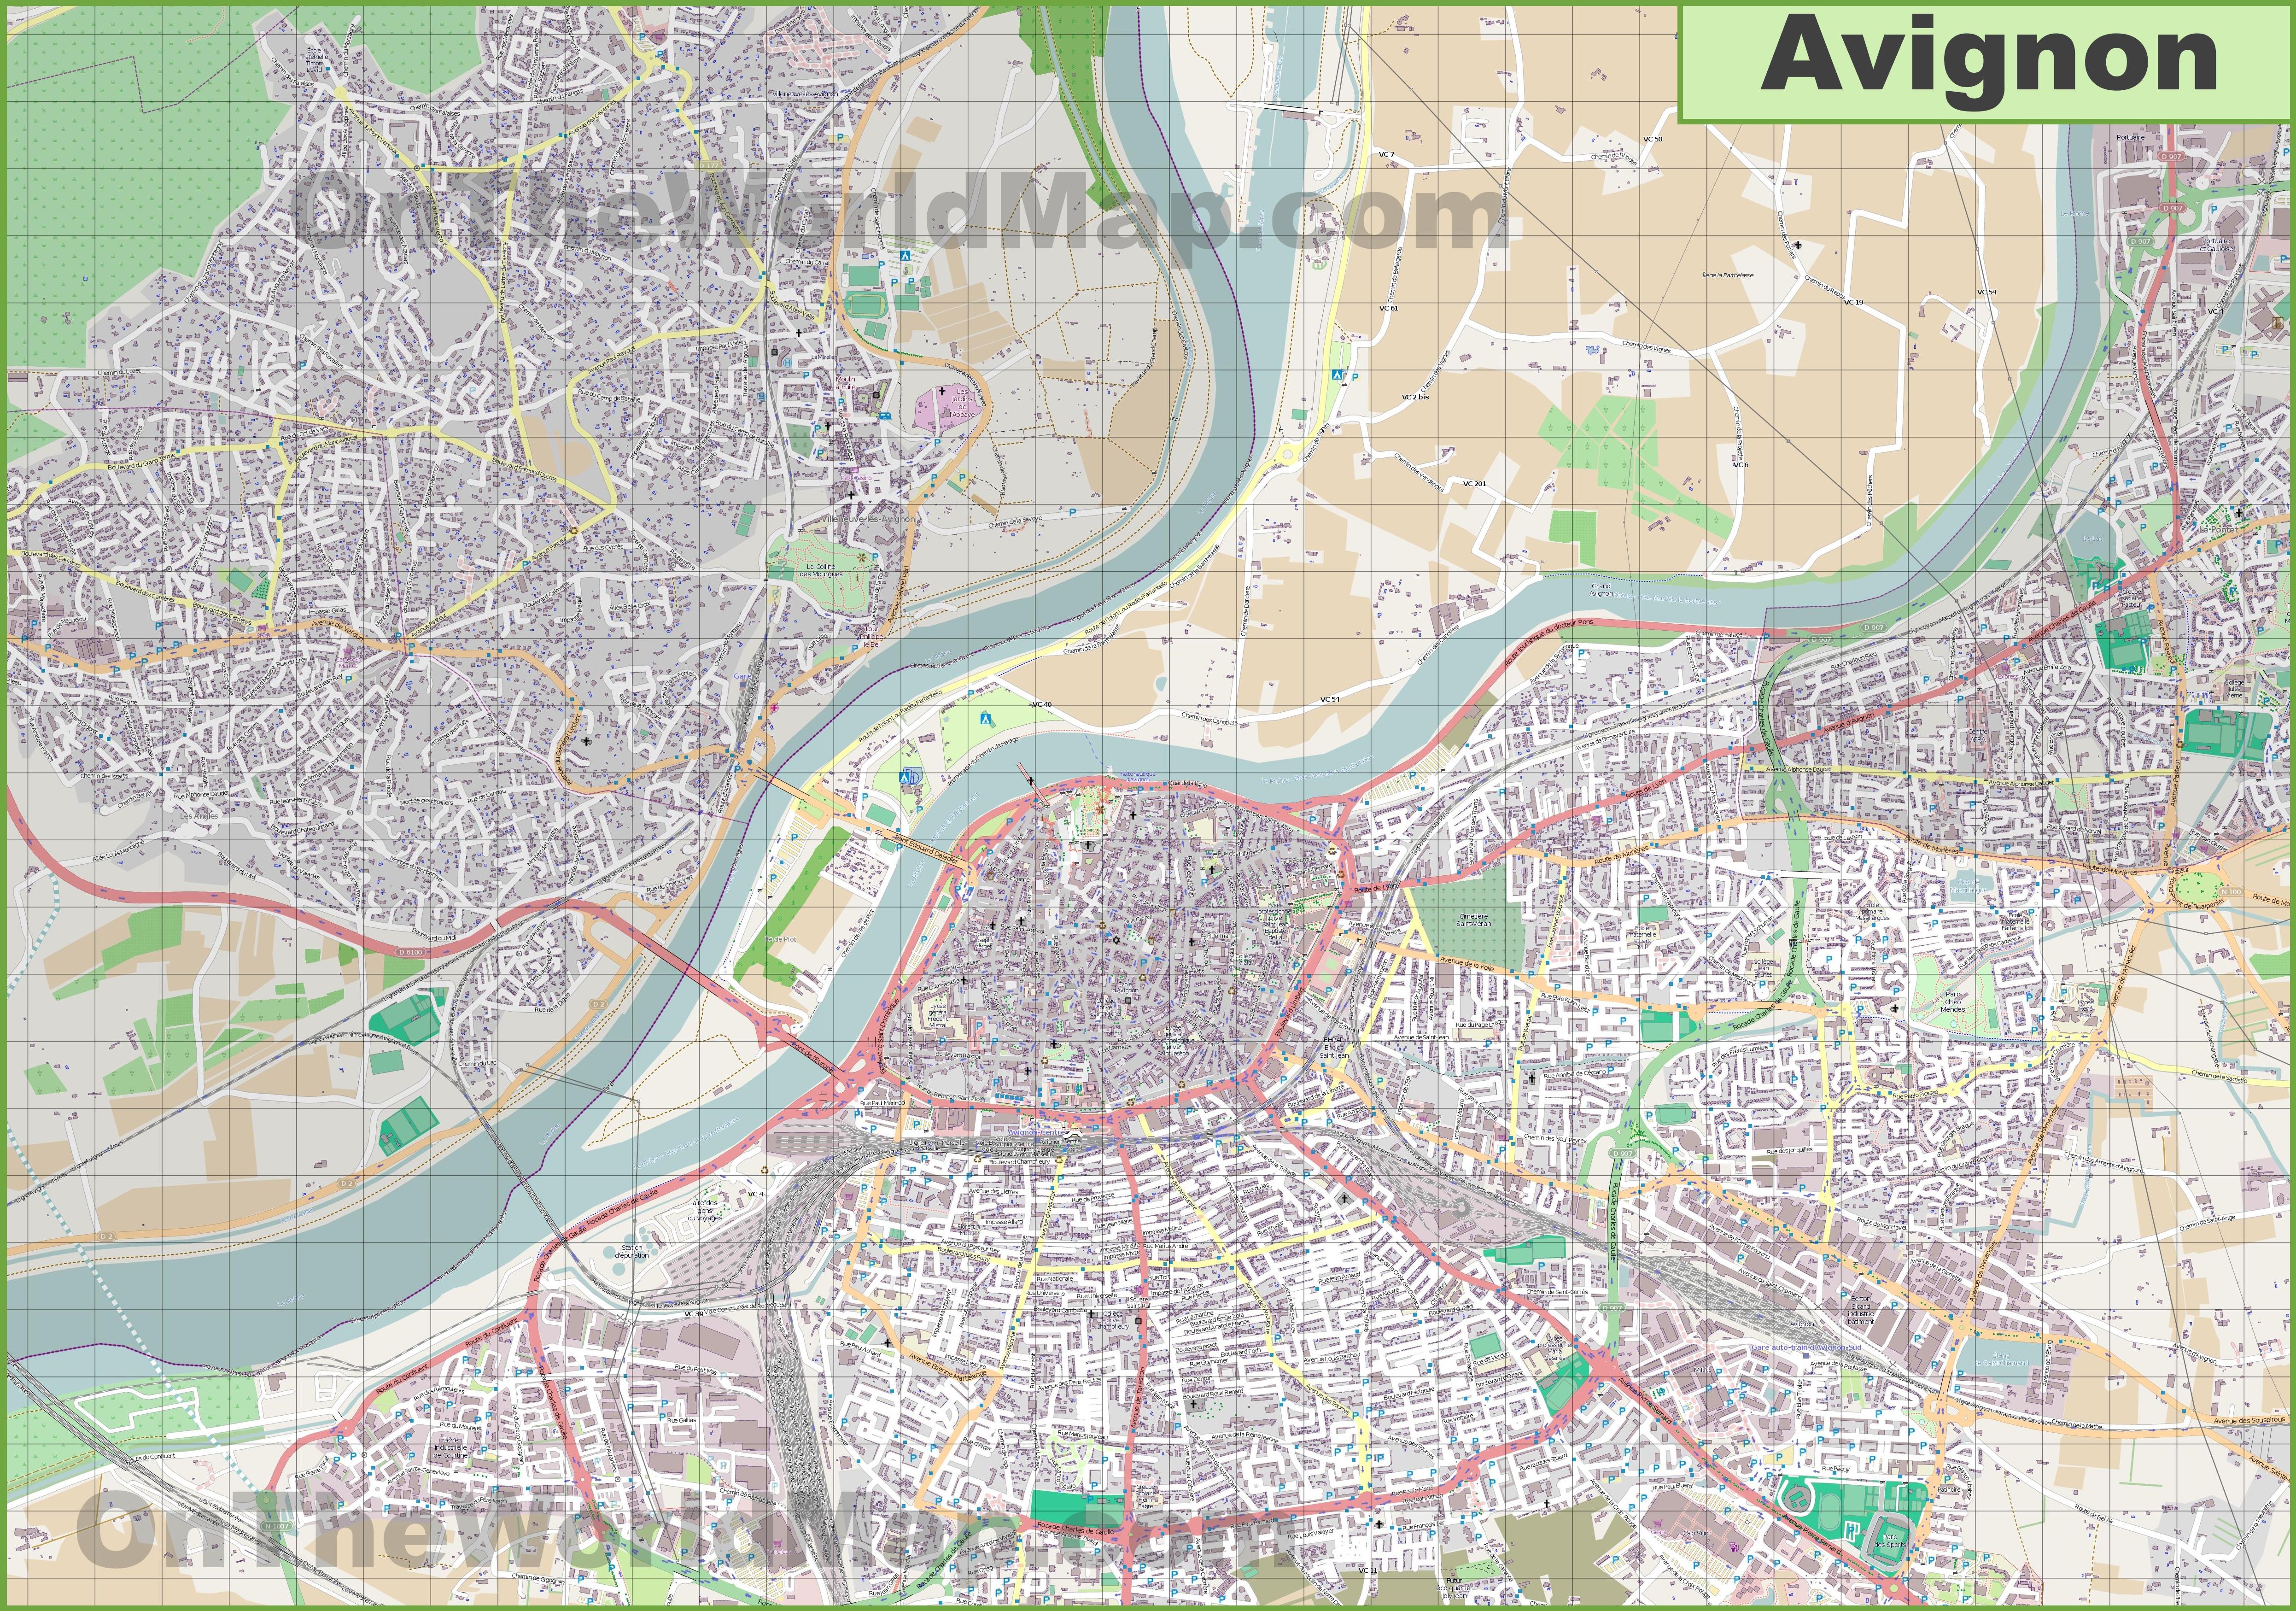 Avignon Map badlands national park map ghana map